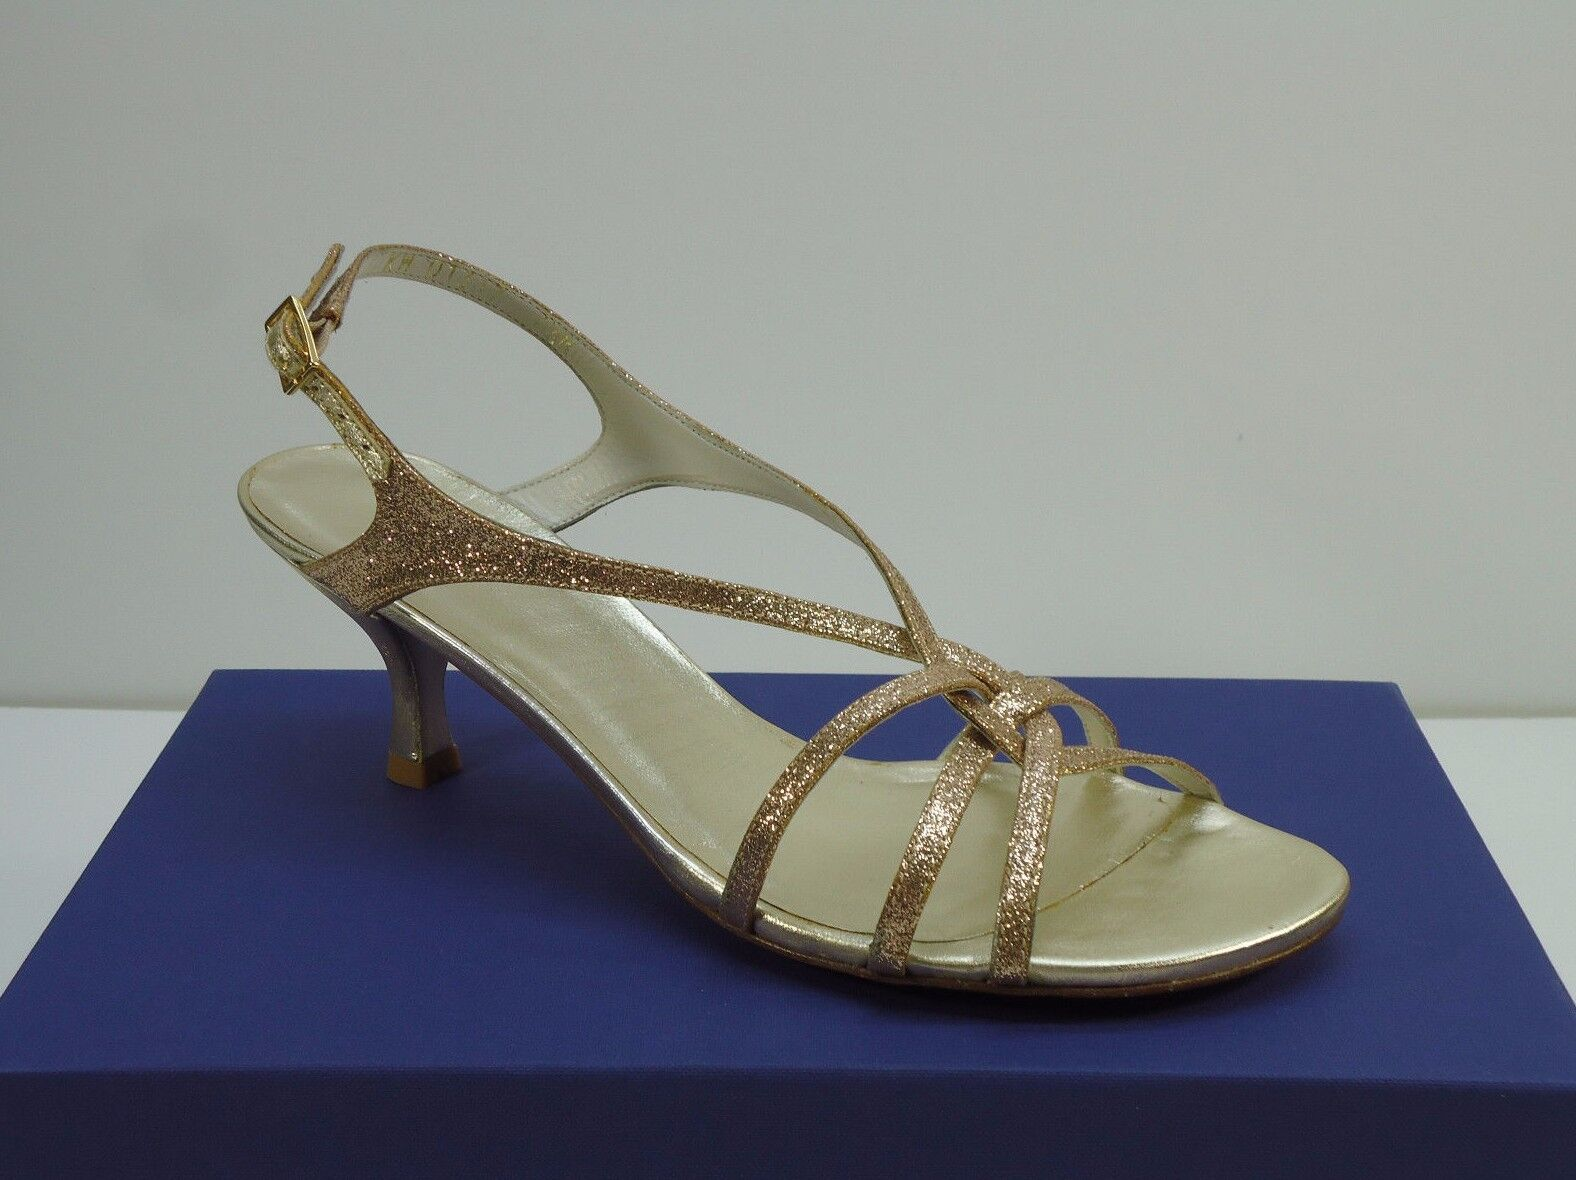 Stuart Weitzman Zone Open-Toe Sandals Sand Mini Glitter Size 7.5 M